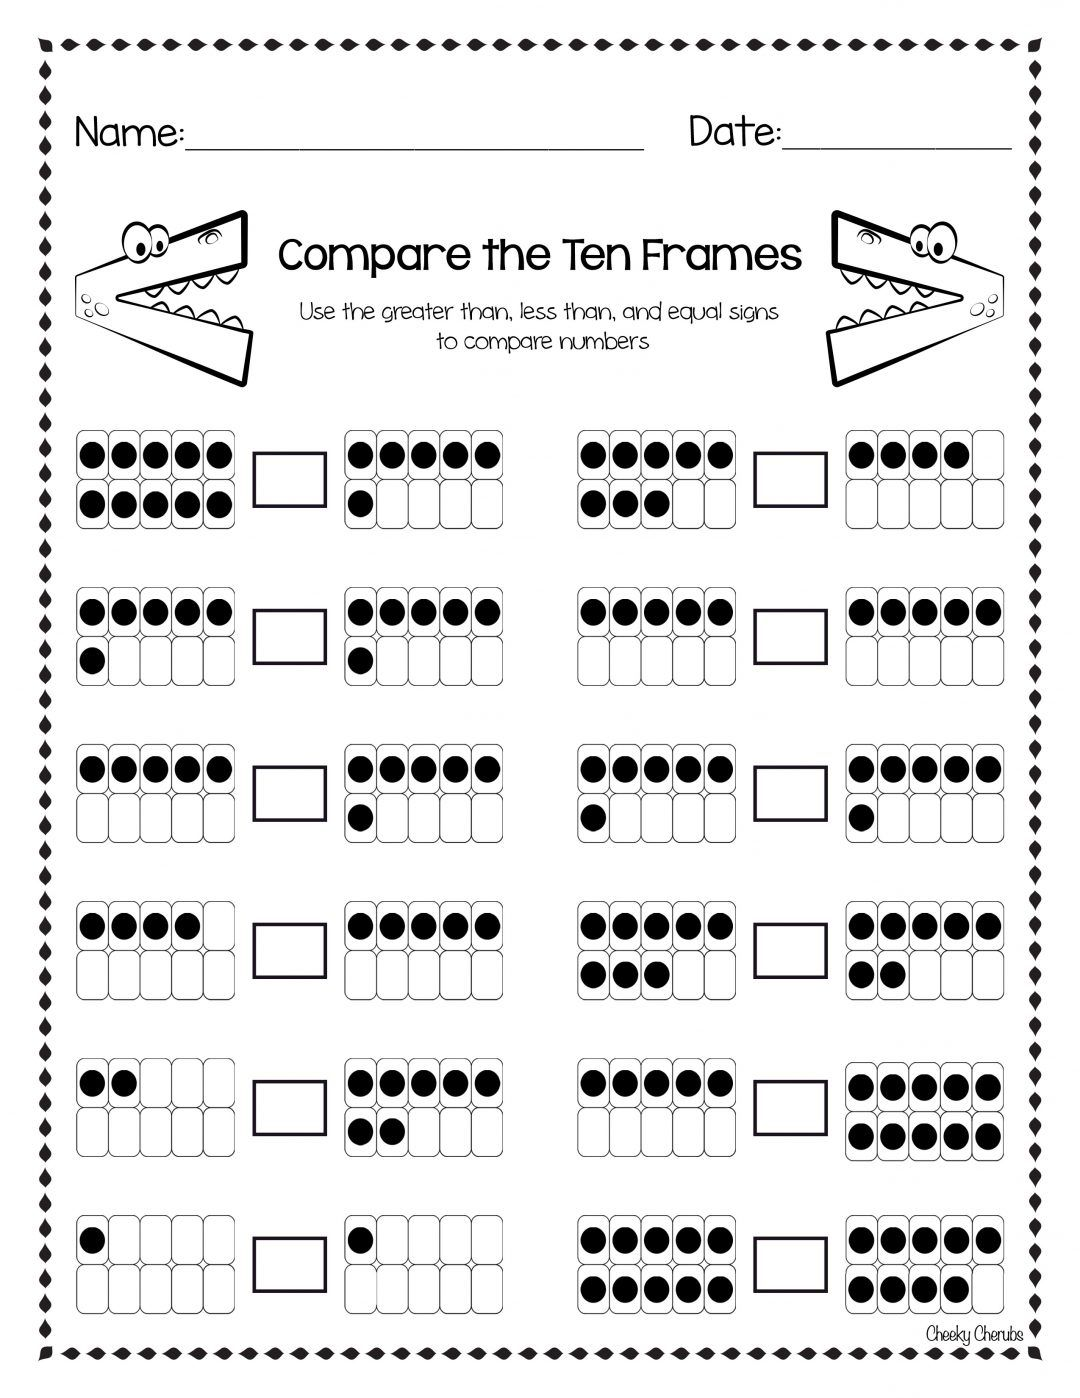 Amazing FREEBIES for Amazing TEACHERS - The CheekyCherubs   Numbers  kindergarten [ 1398 x 1080 Pixel ]